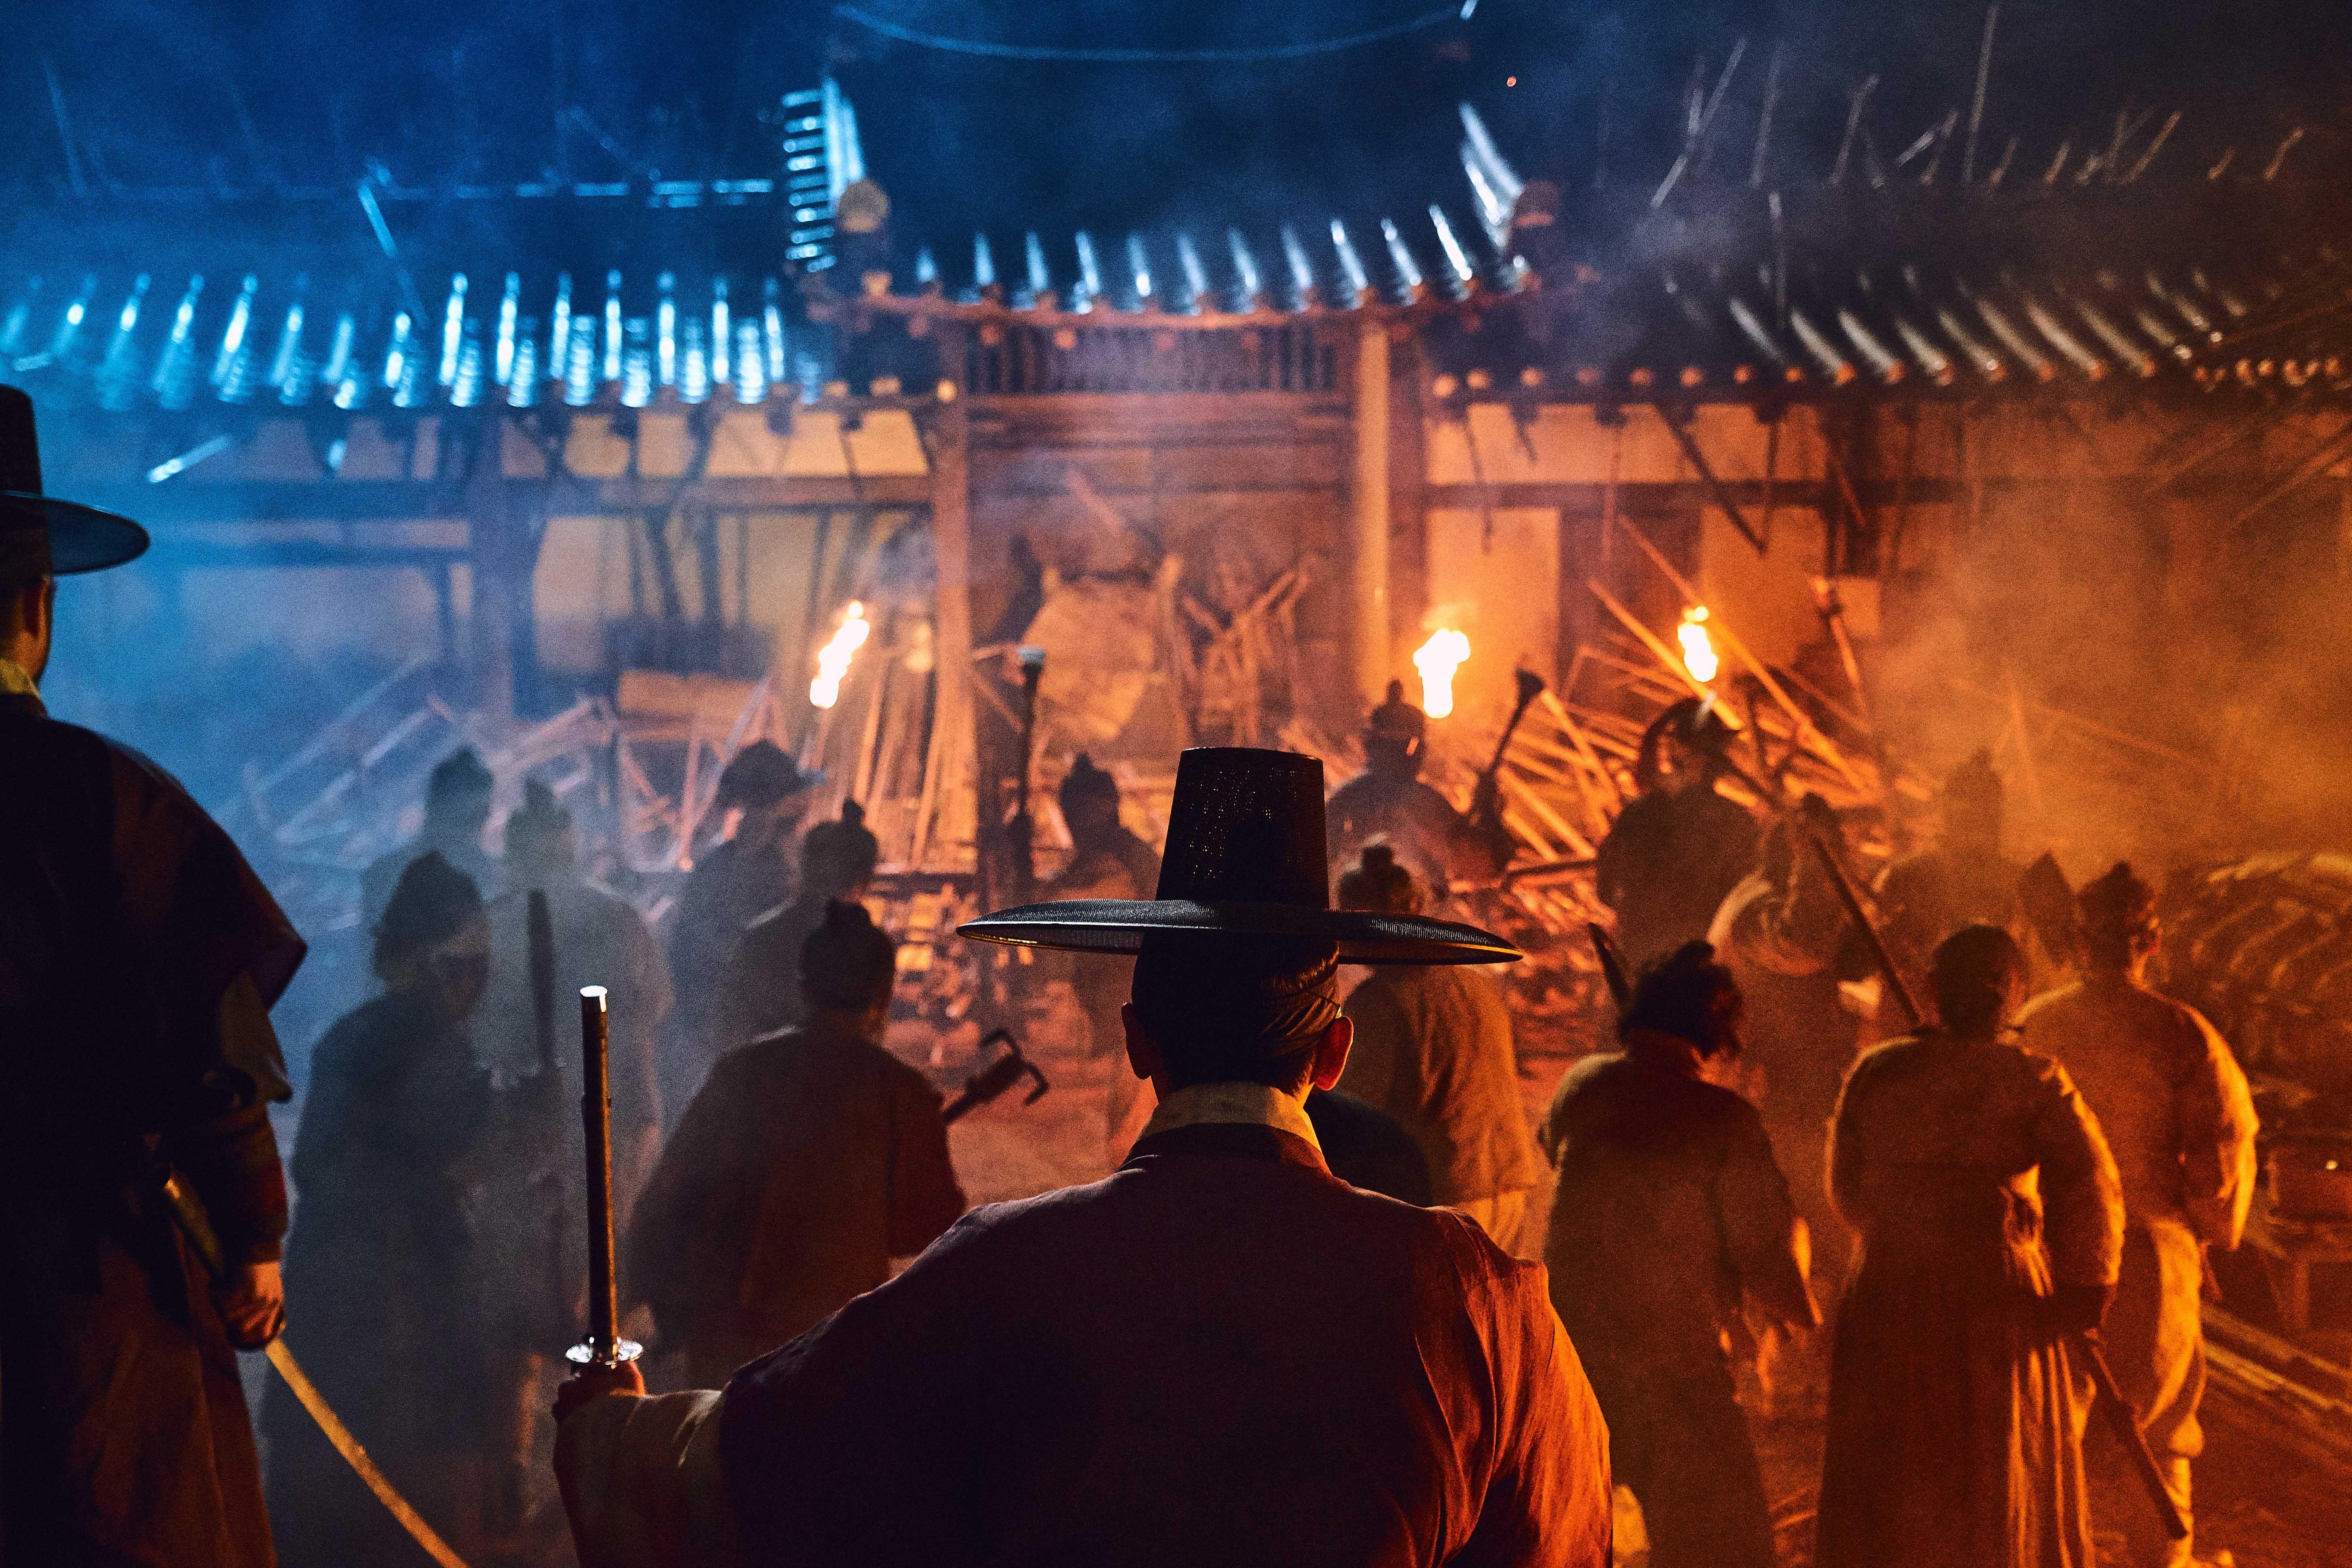 New Kingdom Trailer Teases Netflix S South Korean Zombie Series